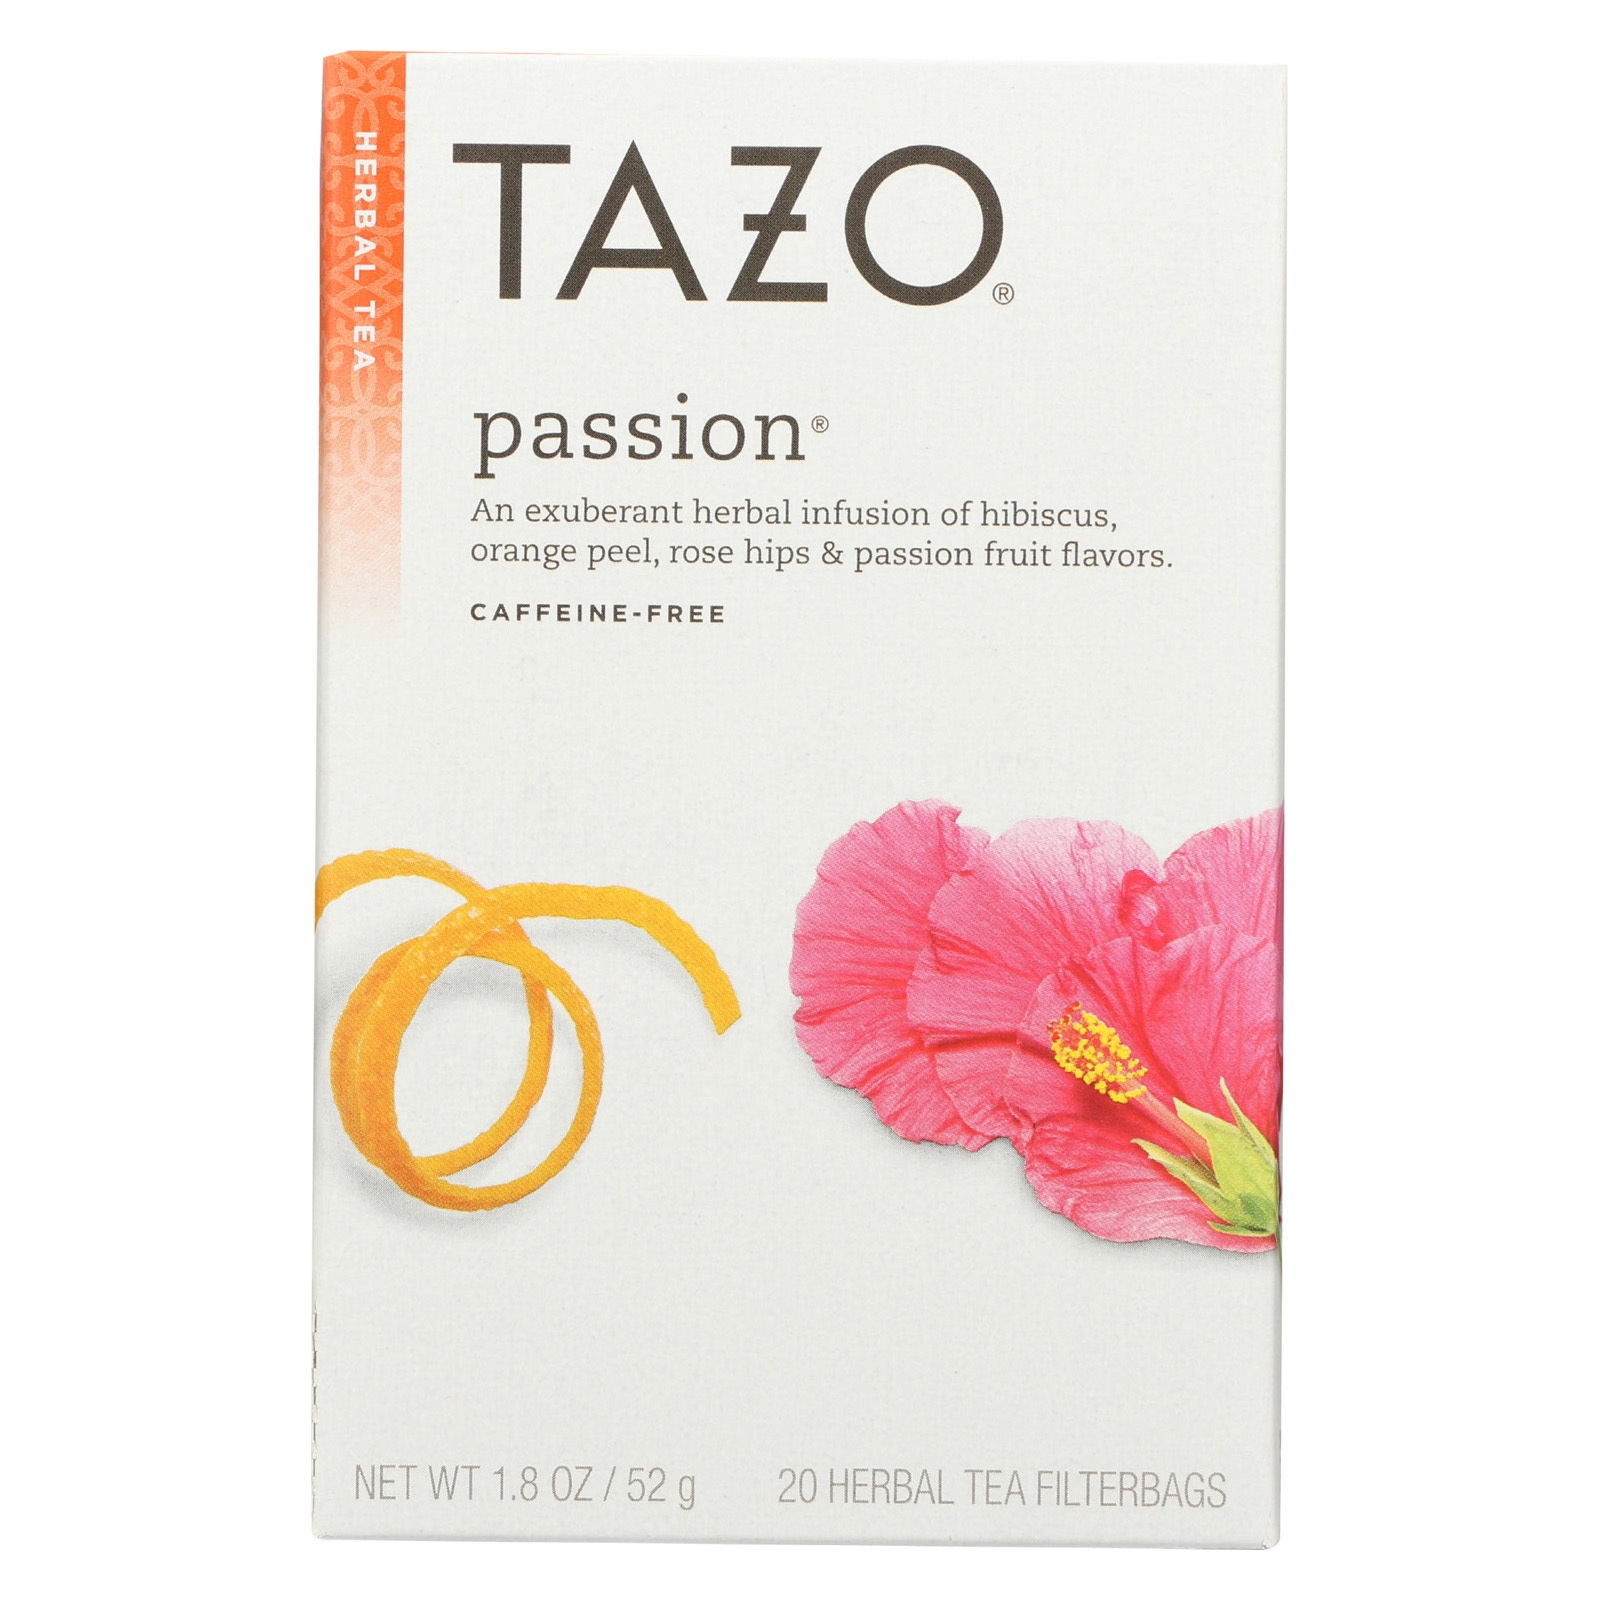 Tazo Tea Herbal Tea - Passion - Case of 6 - 20 BAG